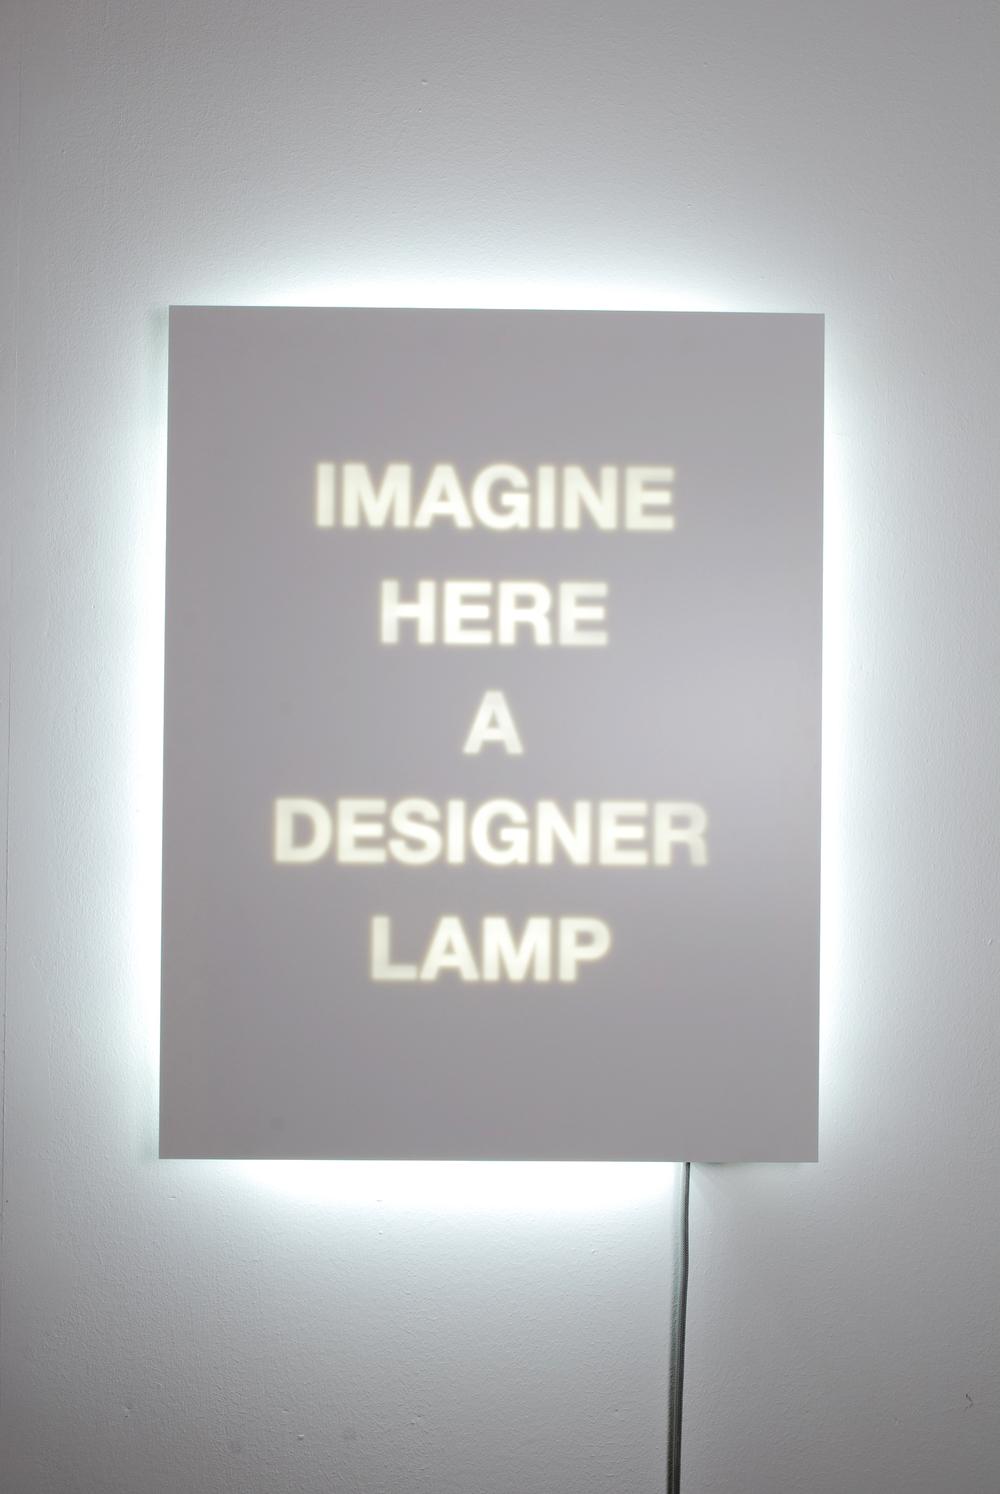 Imaginary Lamp